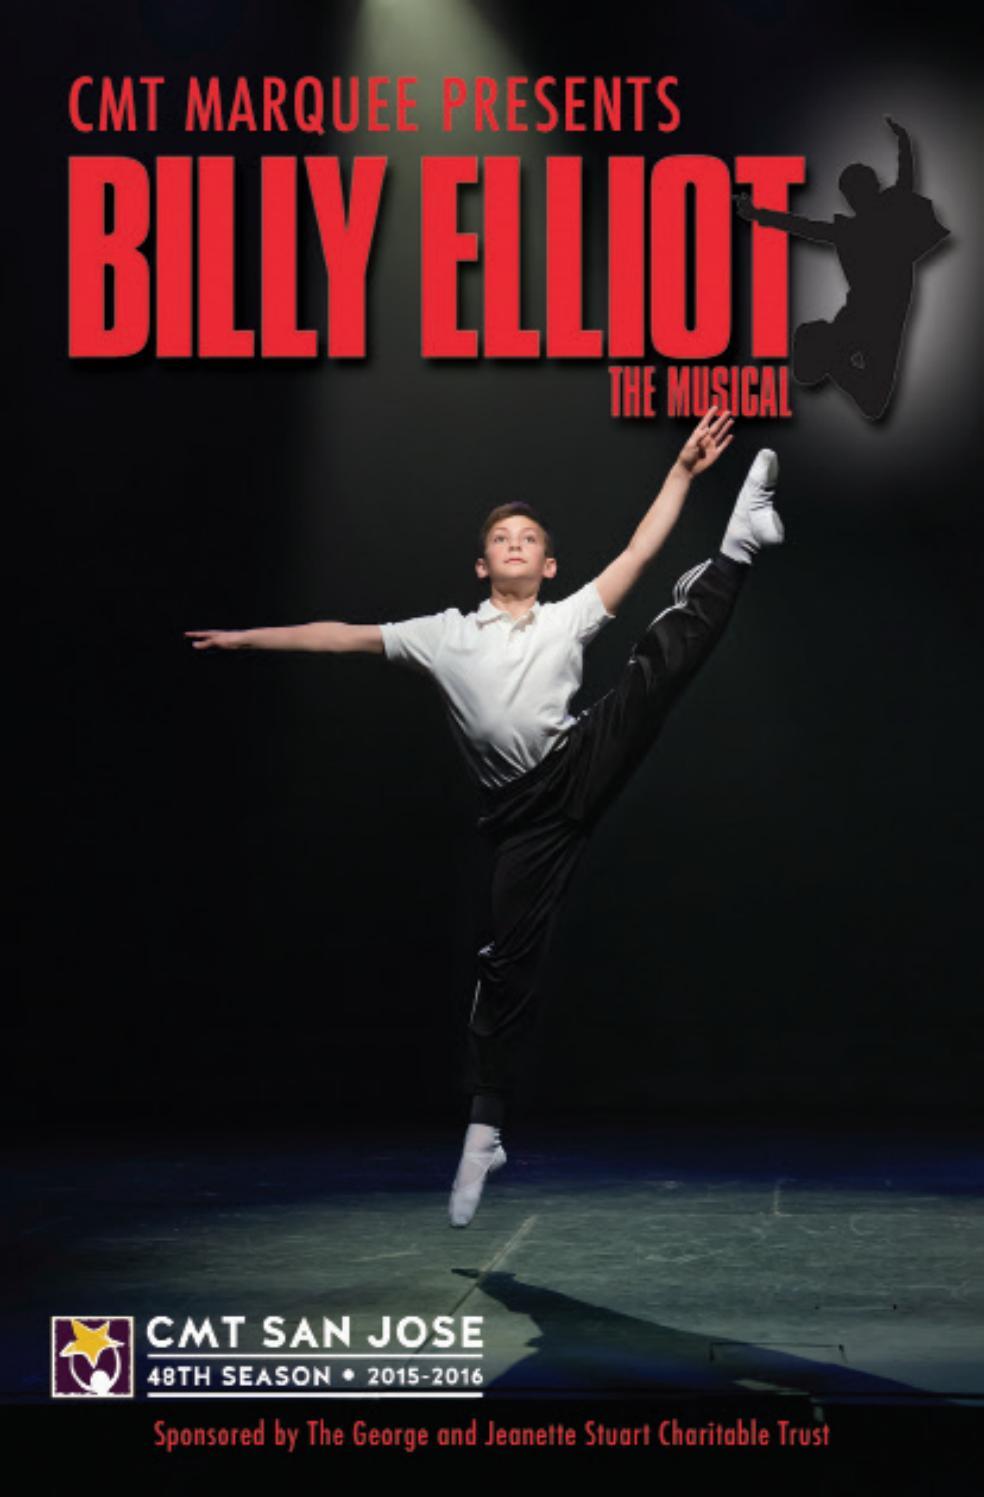 Anderson Koch Ford >> Billy playbill d by UsherIN - Issuu